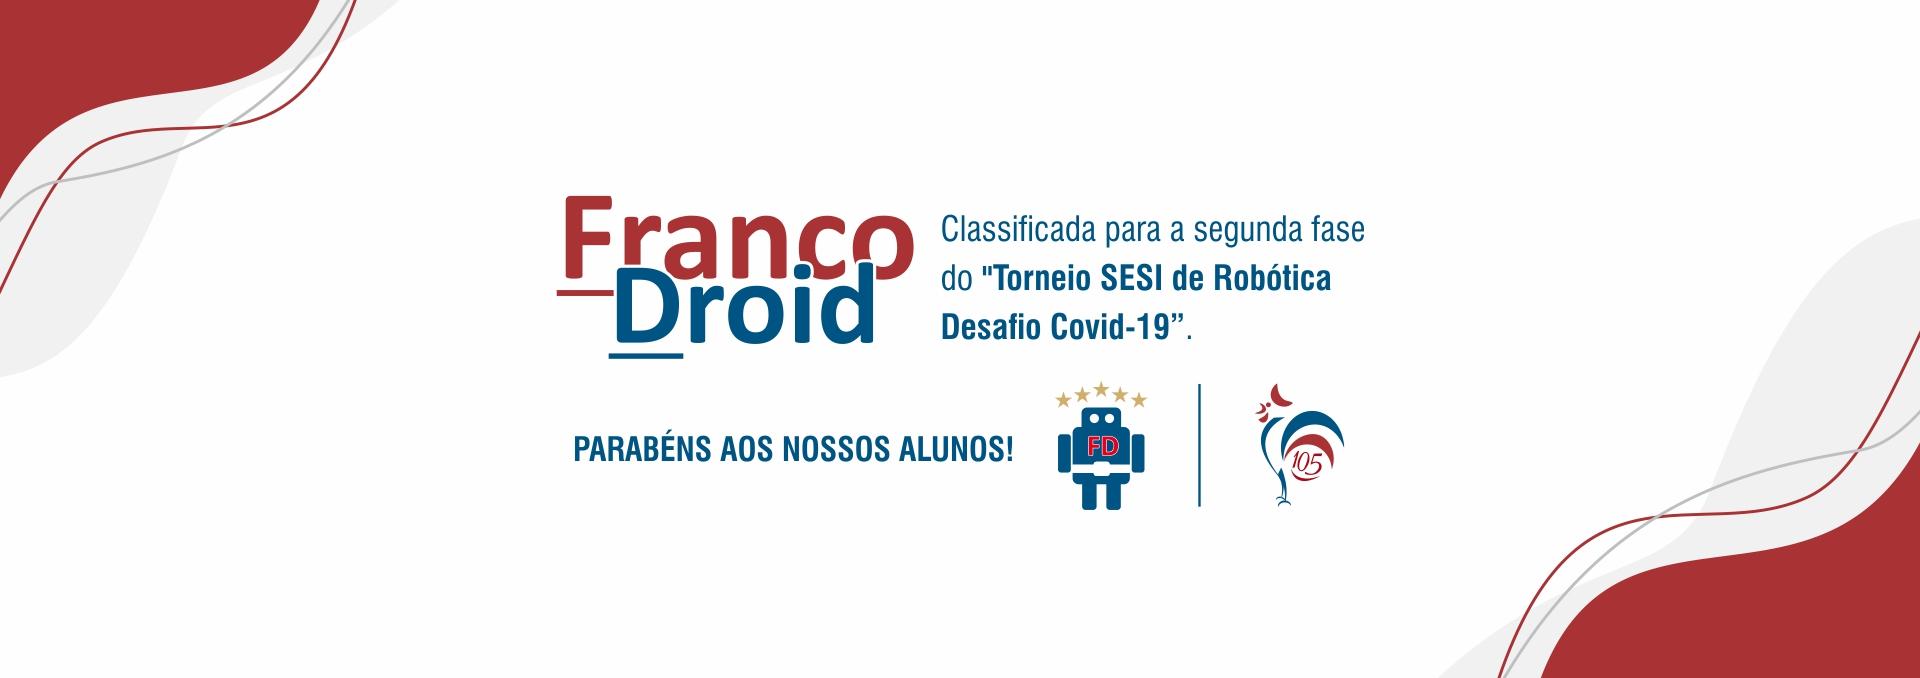 FrancoDroid é classificada para 2ª fase do Torneio SESI de Robótica – Desafio Covid-19